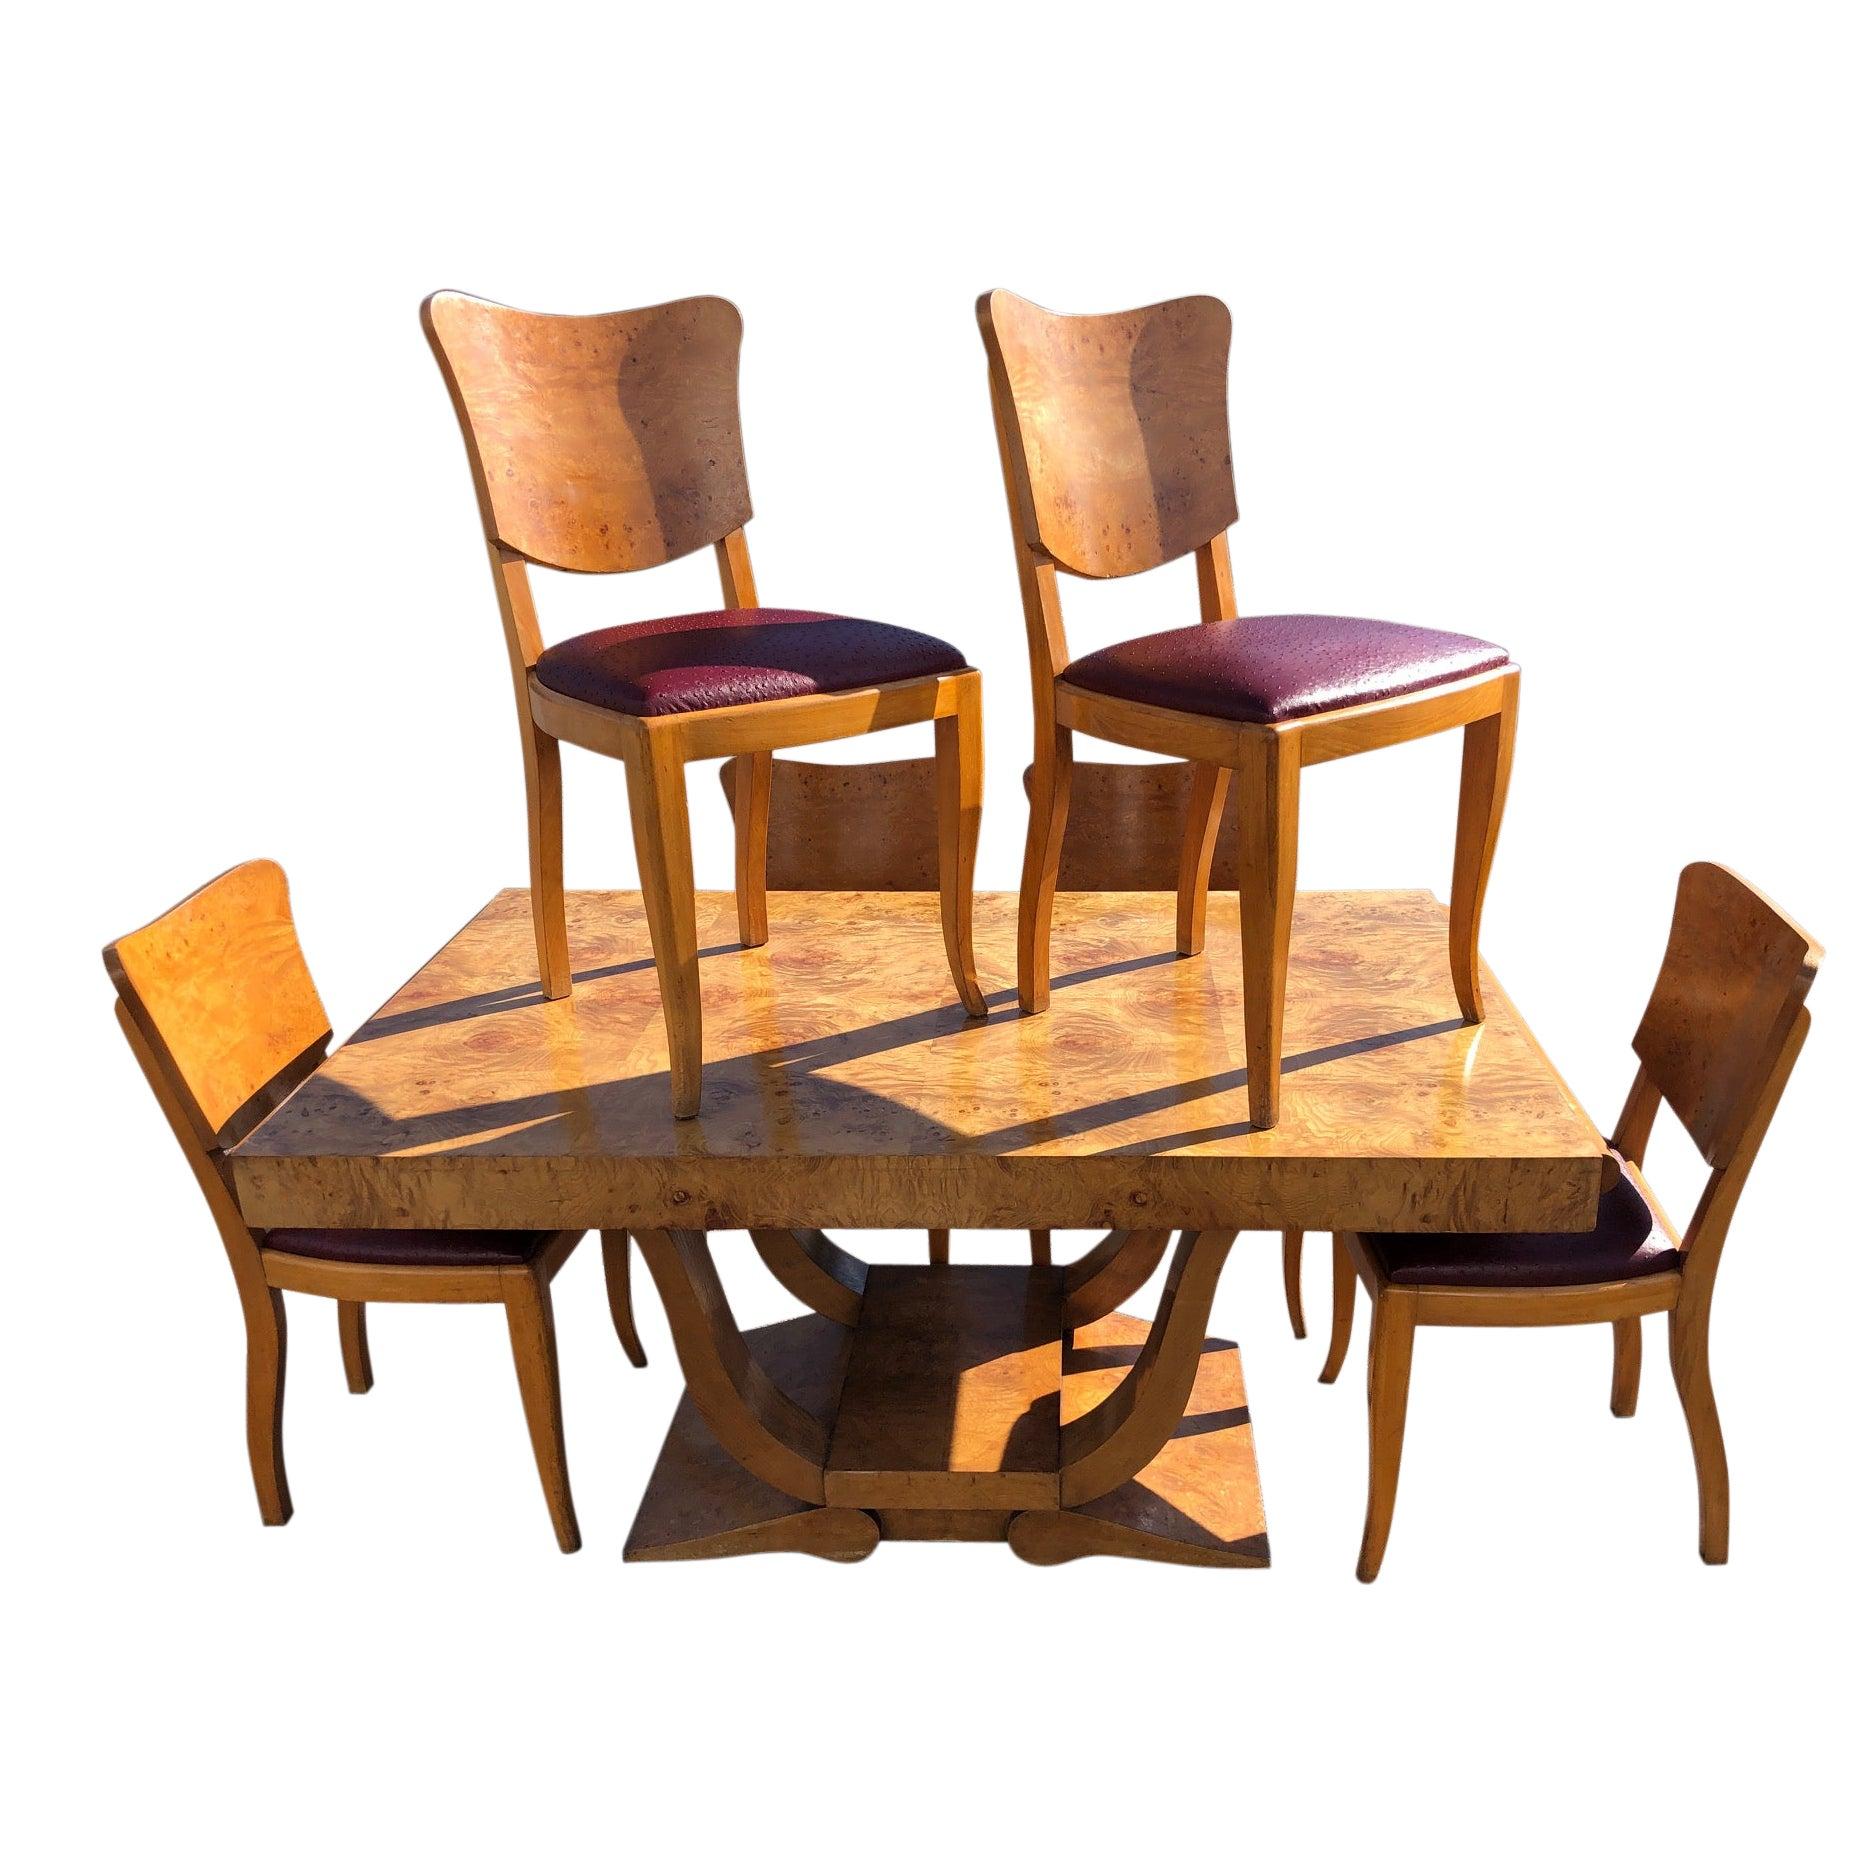 Art Deco Dining Set in Burl Wood